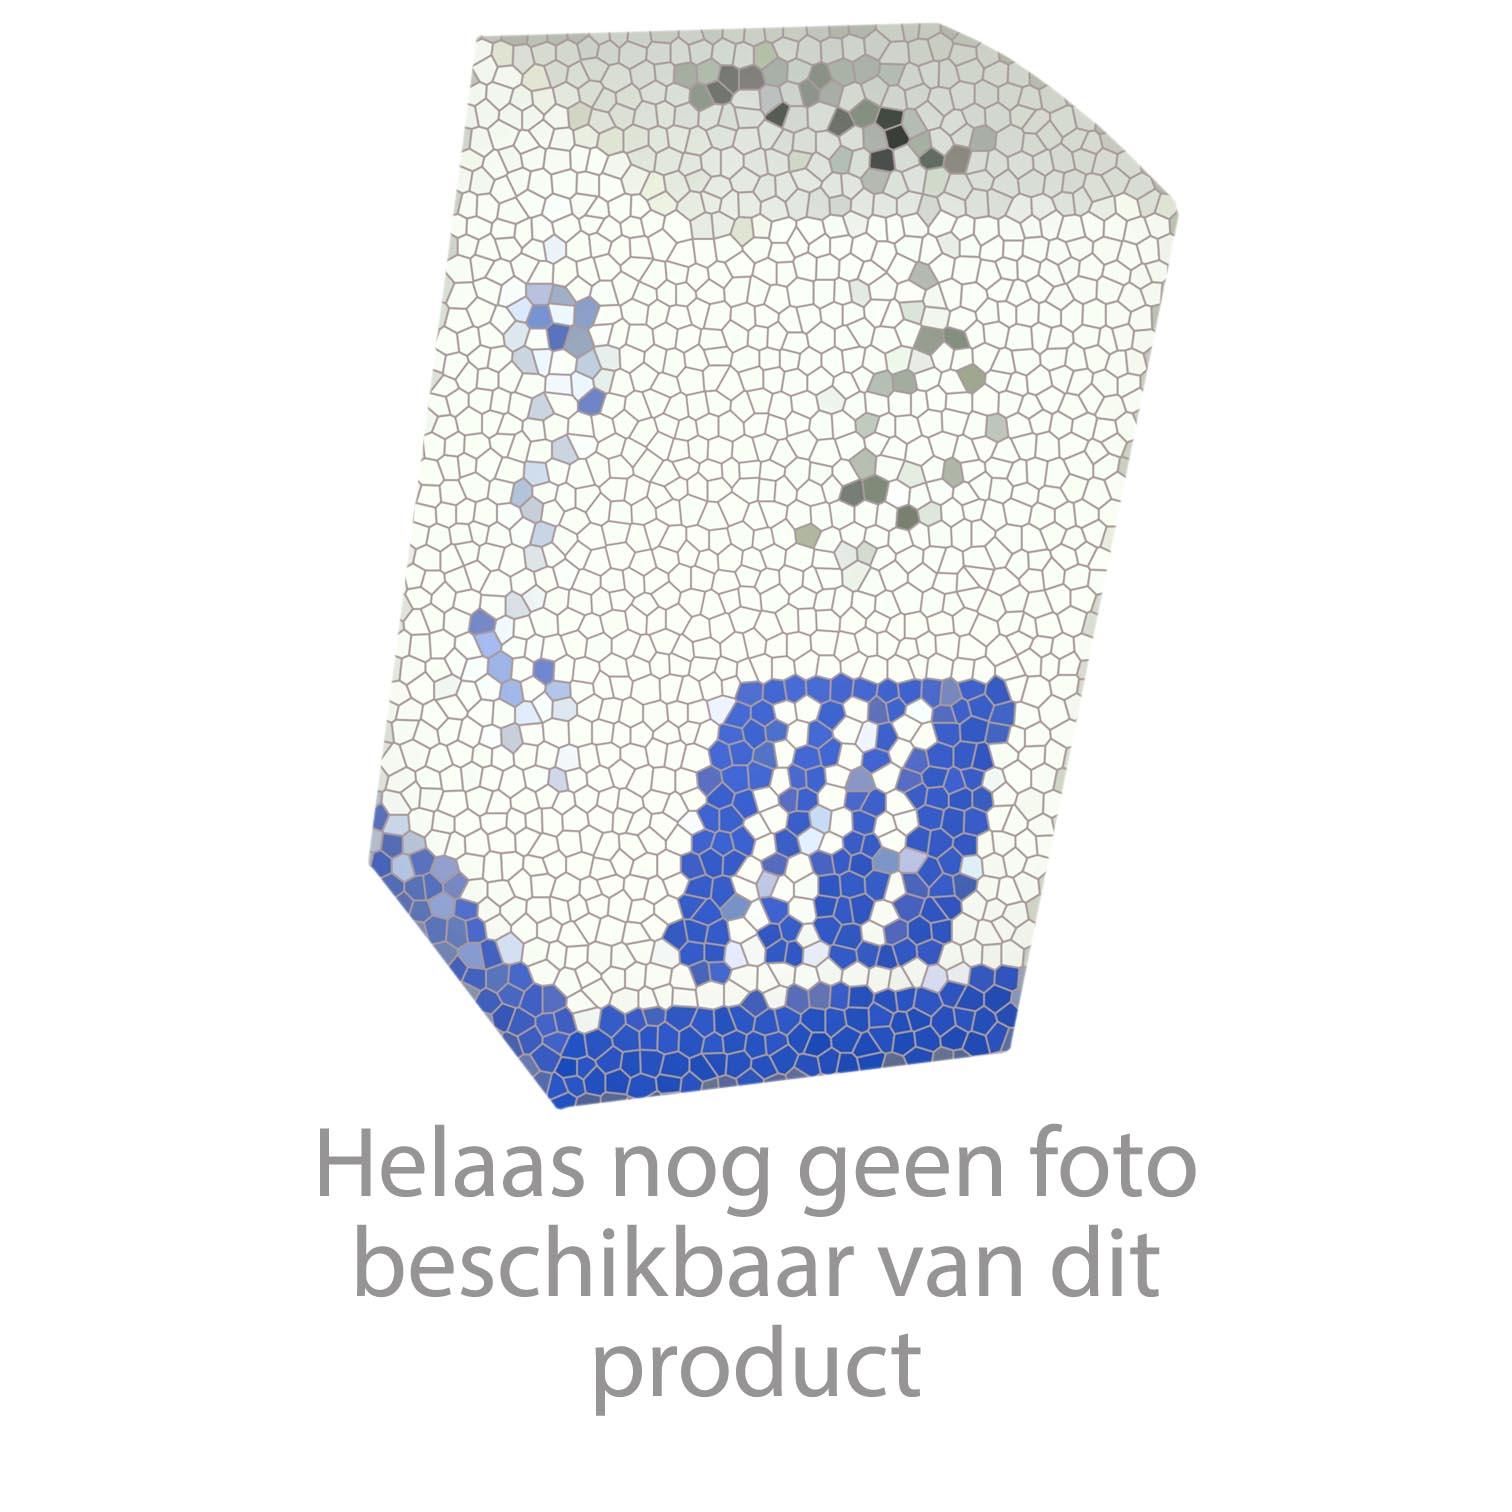 Gessi Onderdelen OXYGENE  HI TECH 2-gats Keukenkraan Artikelnummer 17483.031 / 17483.149